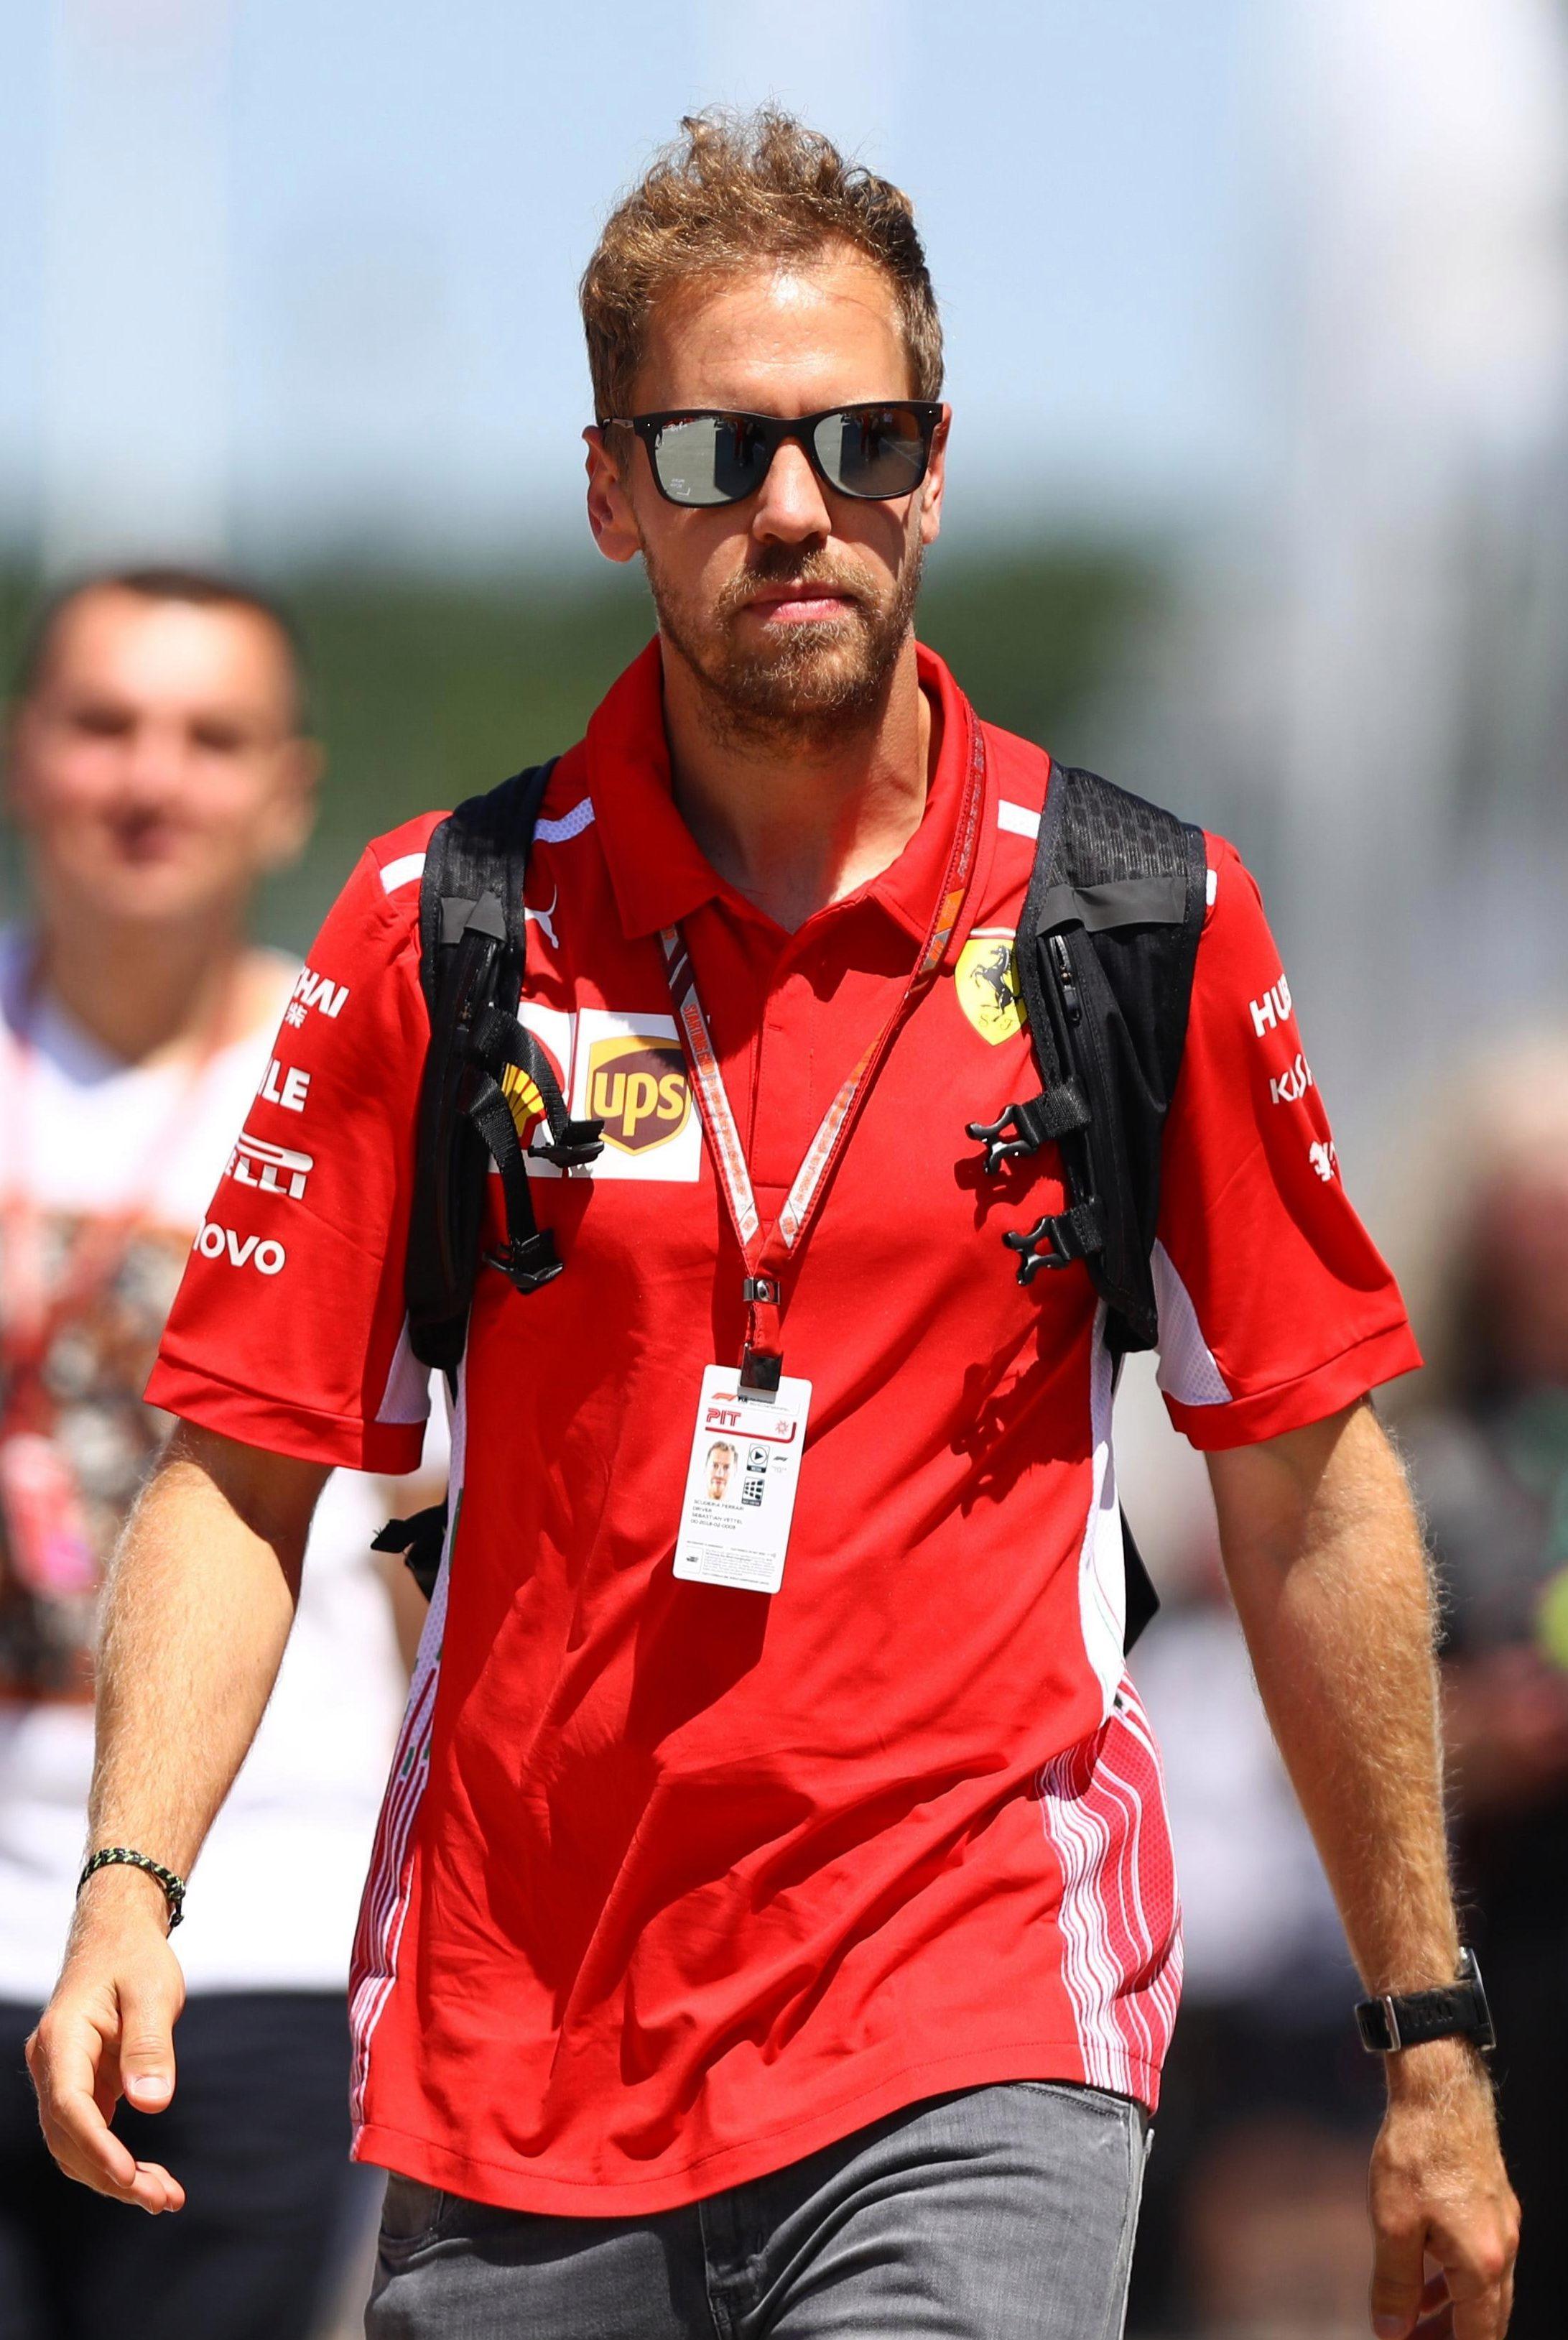 Sebastian Vettel wants to race fairly alongside Hamilton